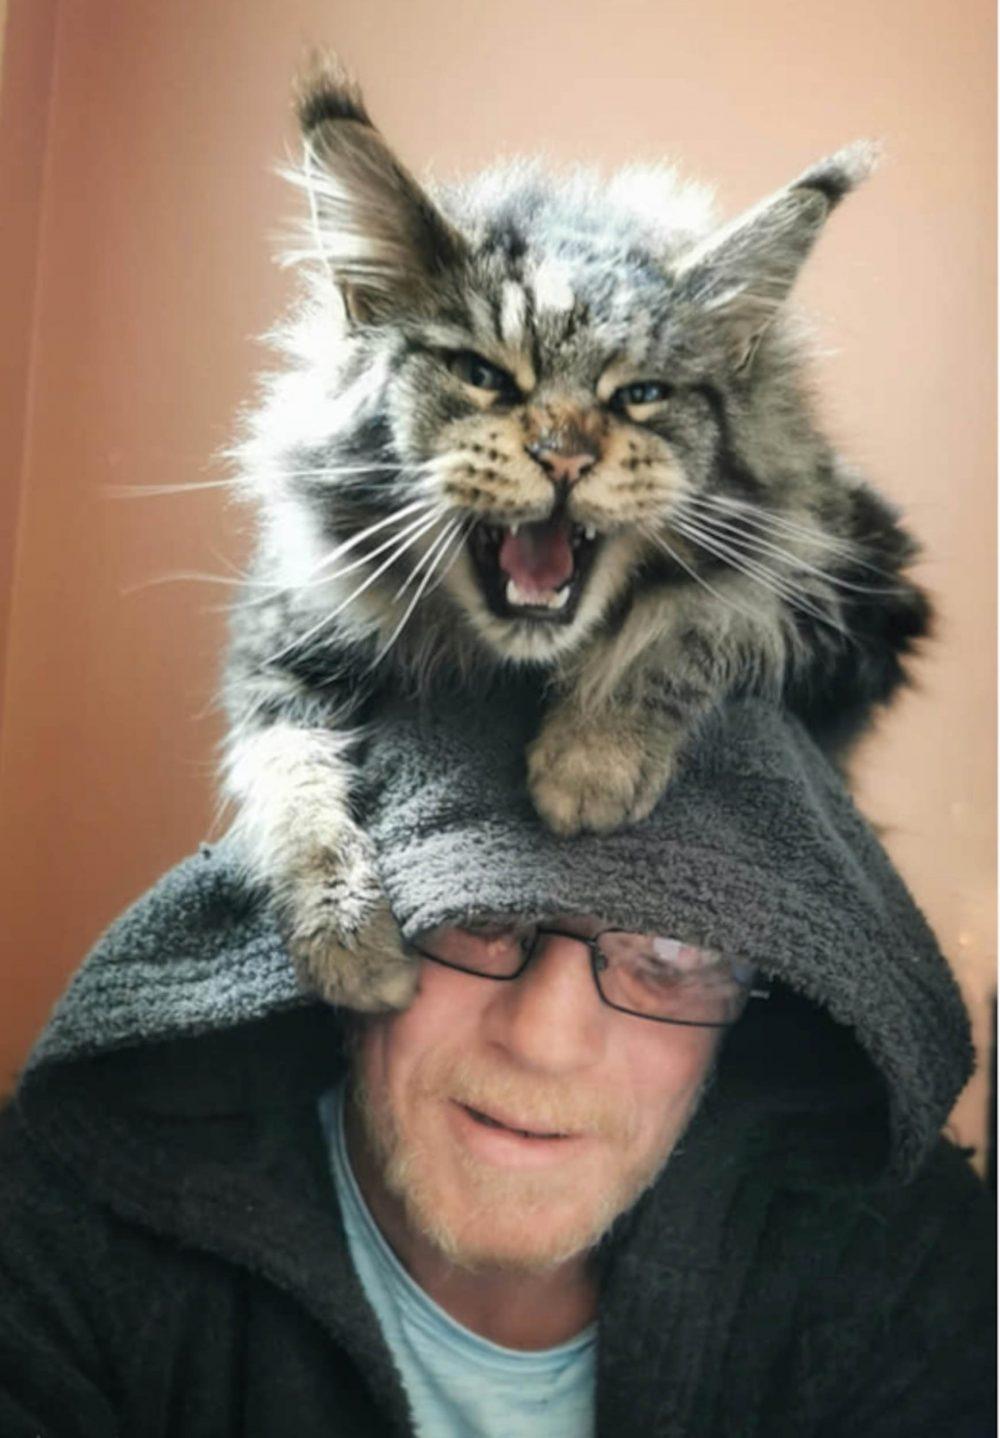 Wallace on William's head - Animal News Scotland